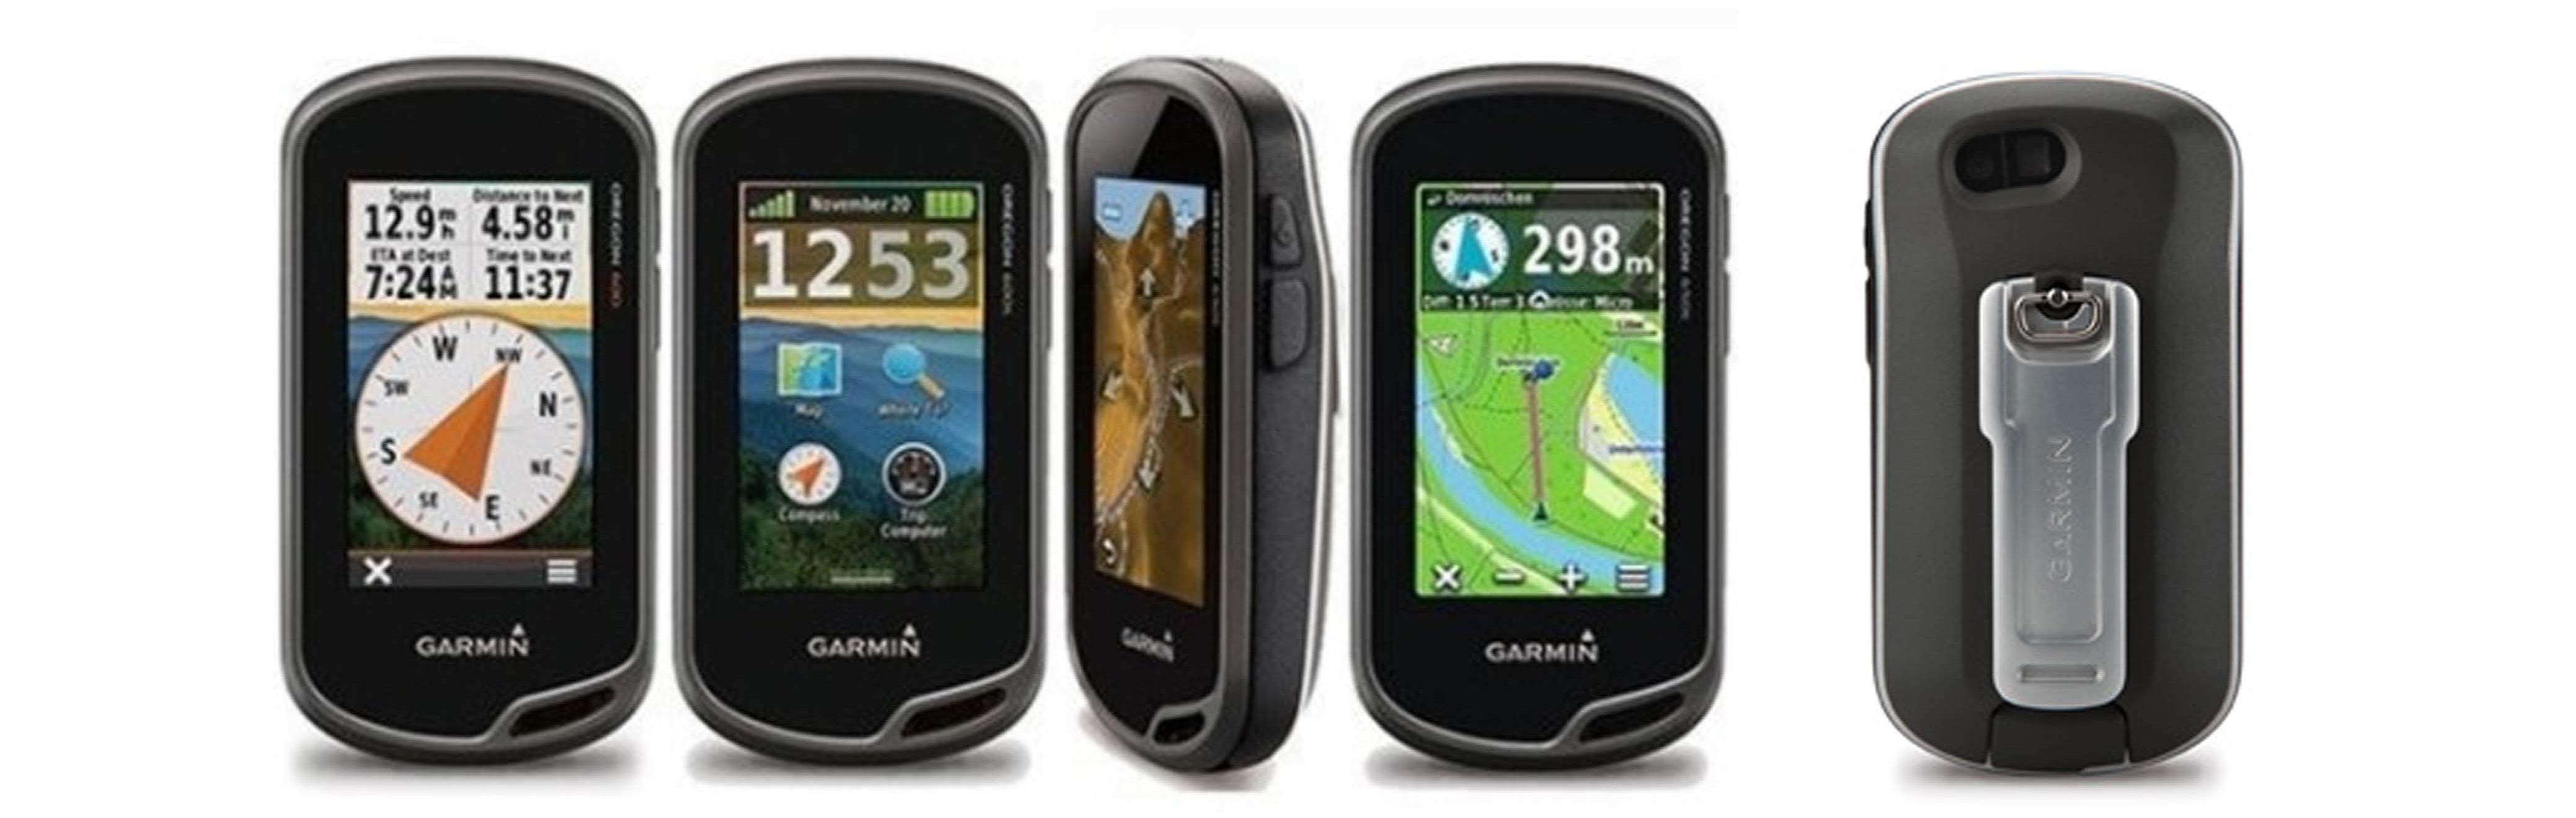 Garmin Oregon 650t 3-Inch Handheld GPS with 8MP Digital Camera